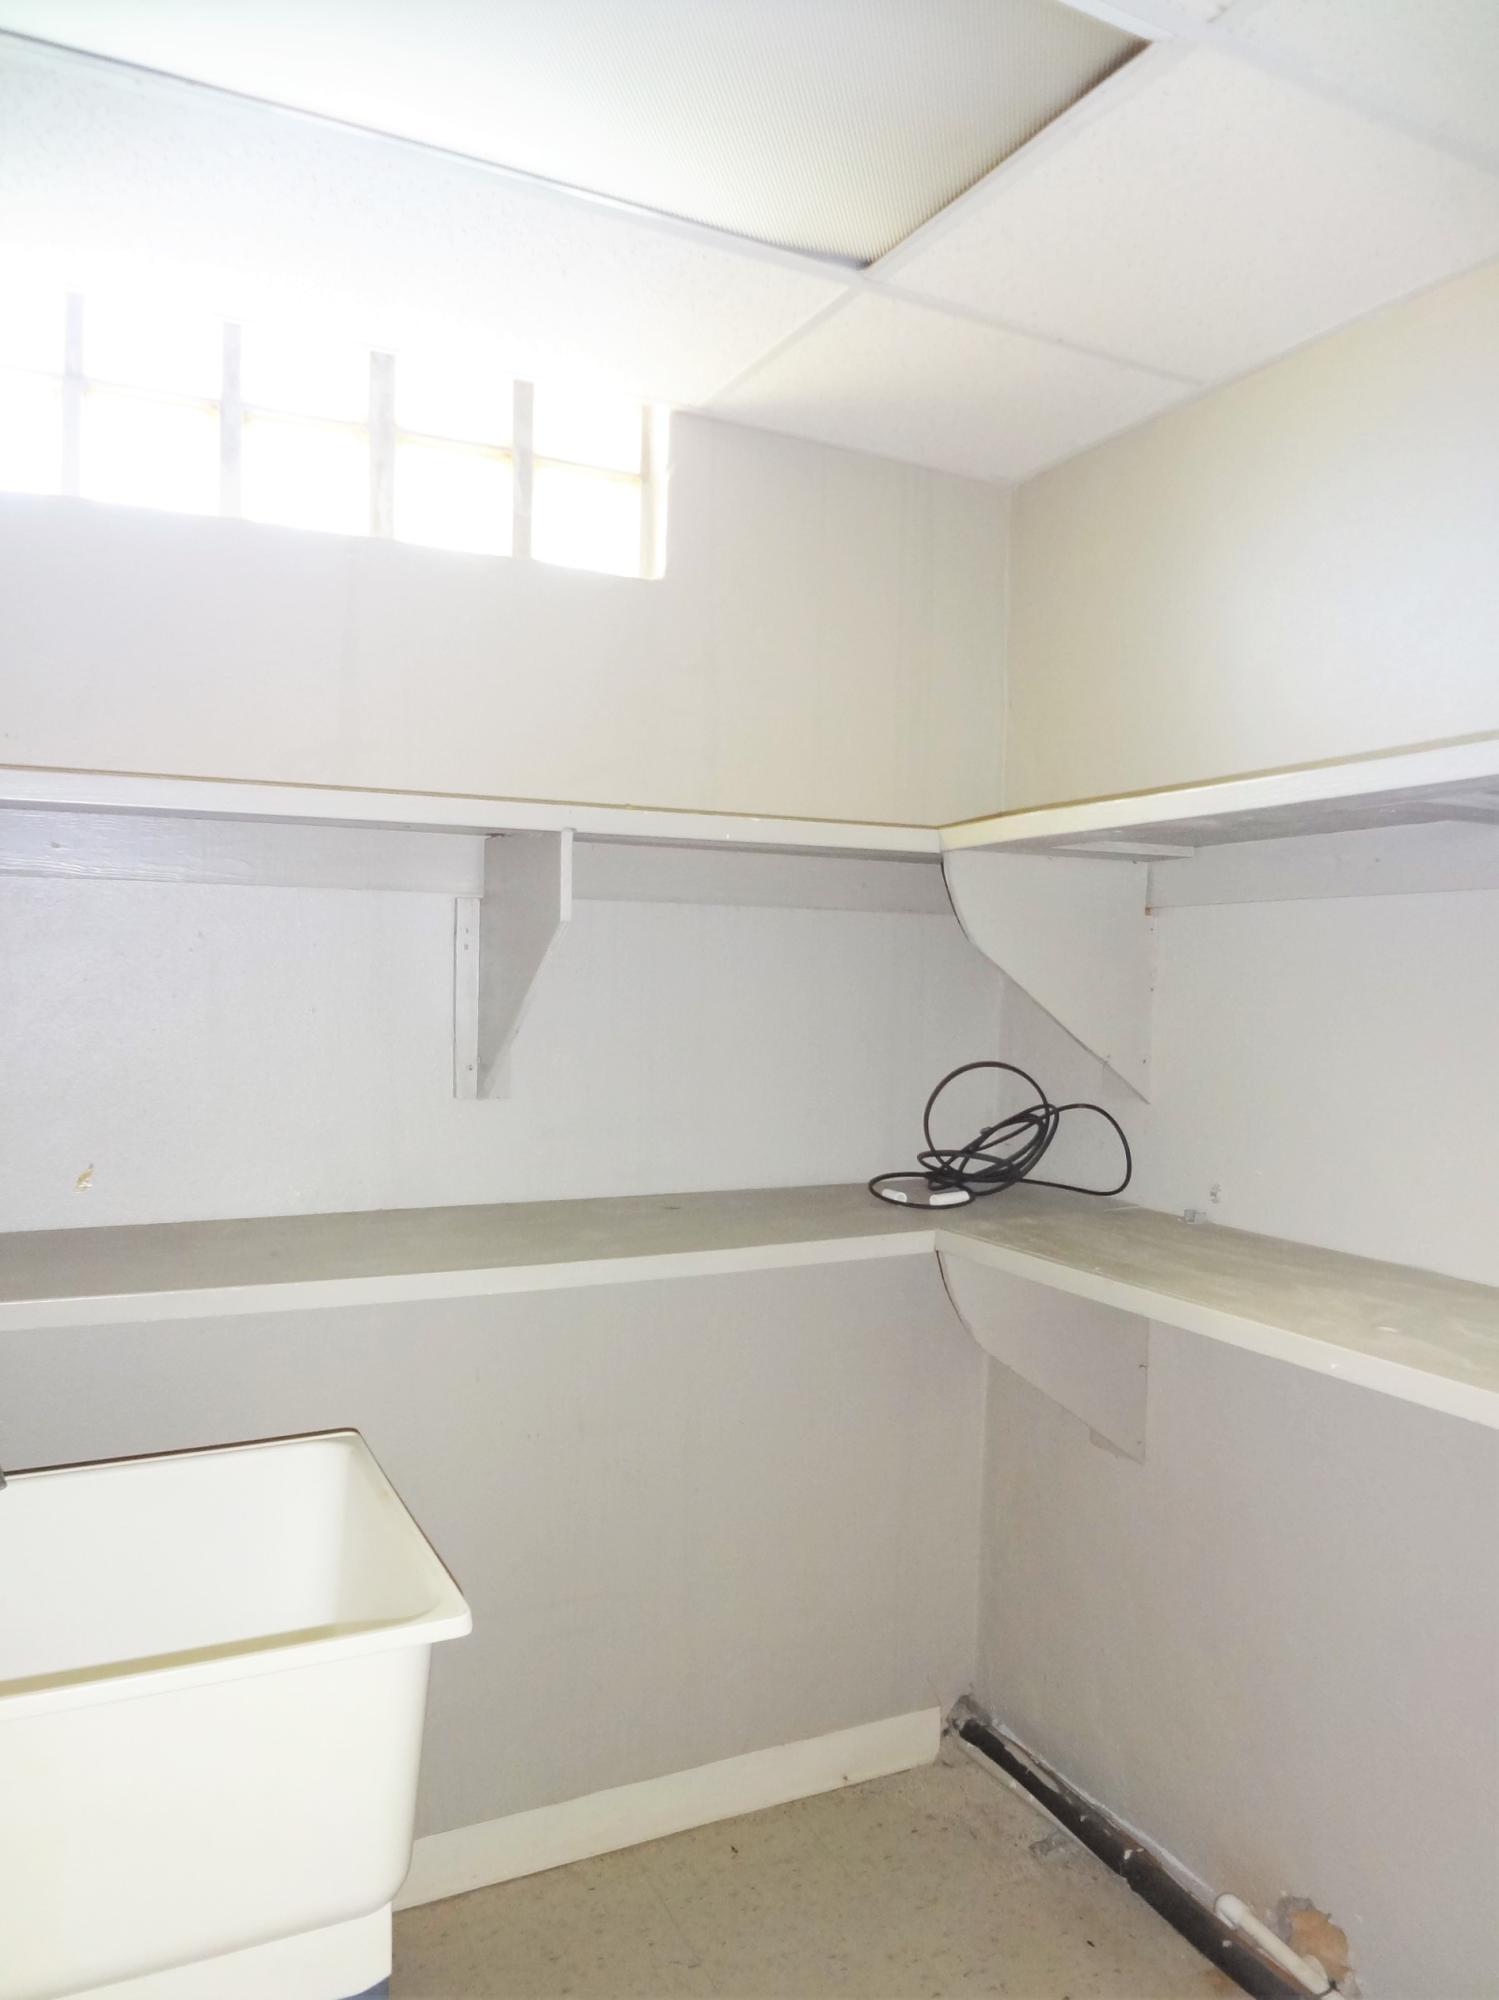 Suite 3 Storage and Sink